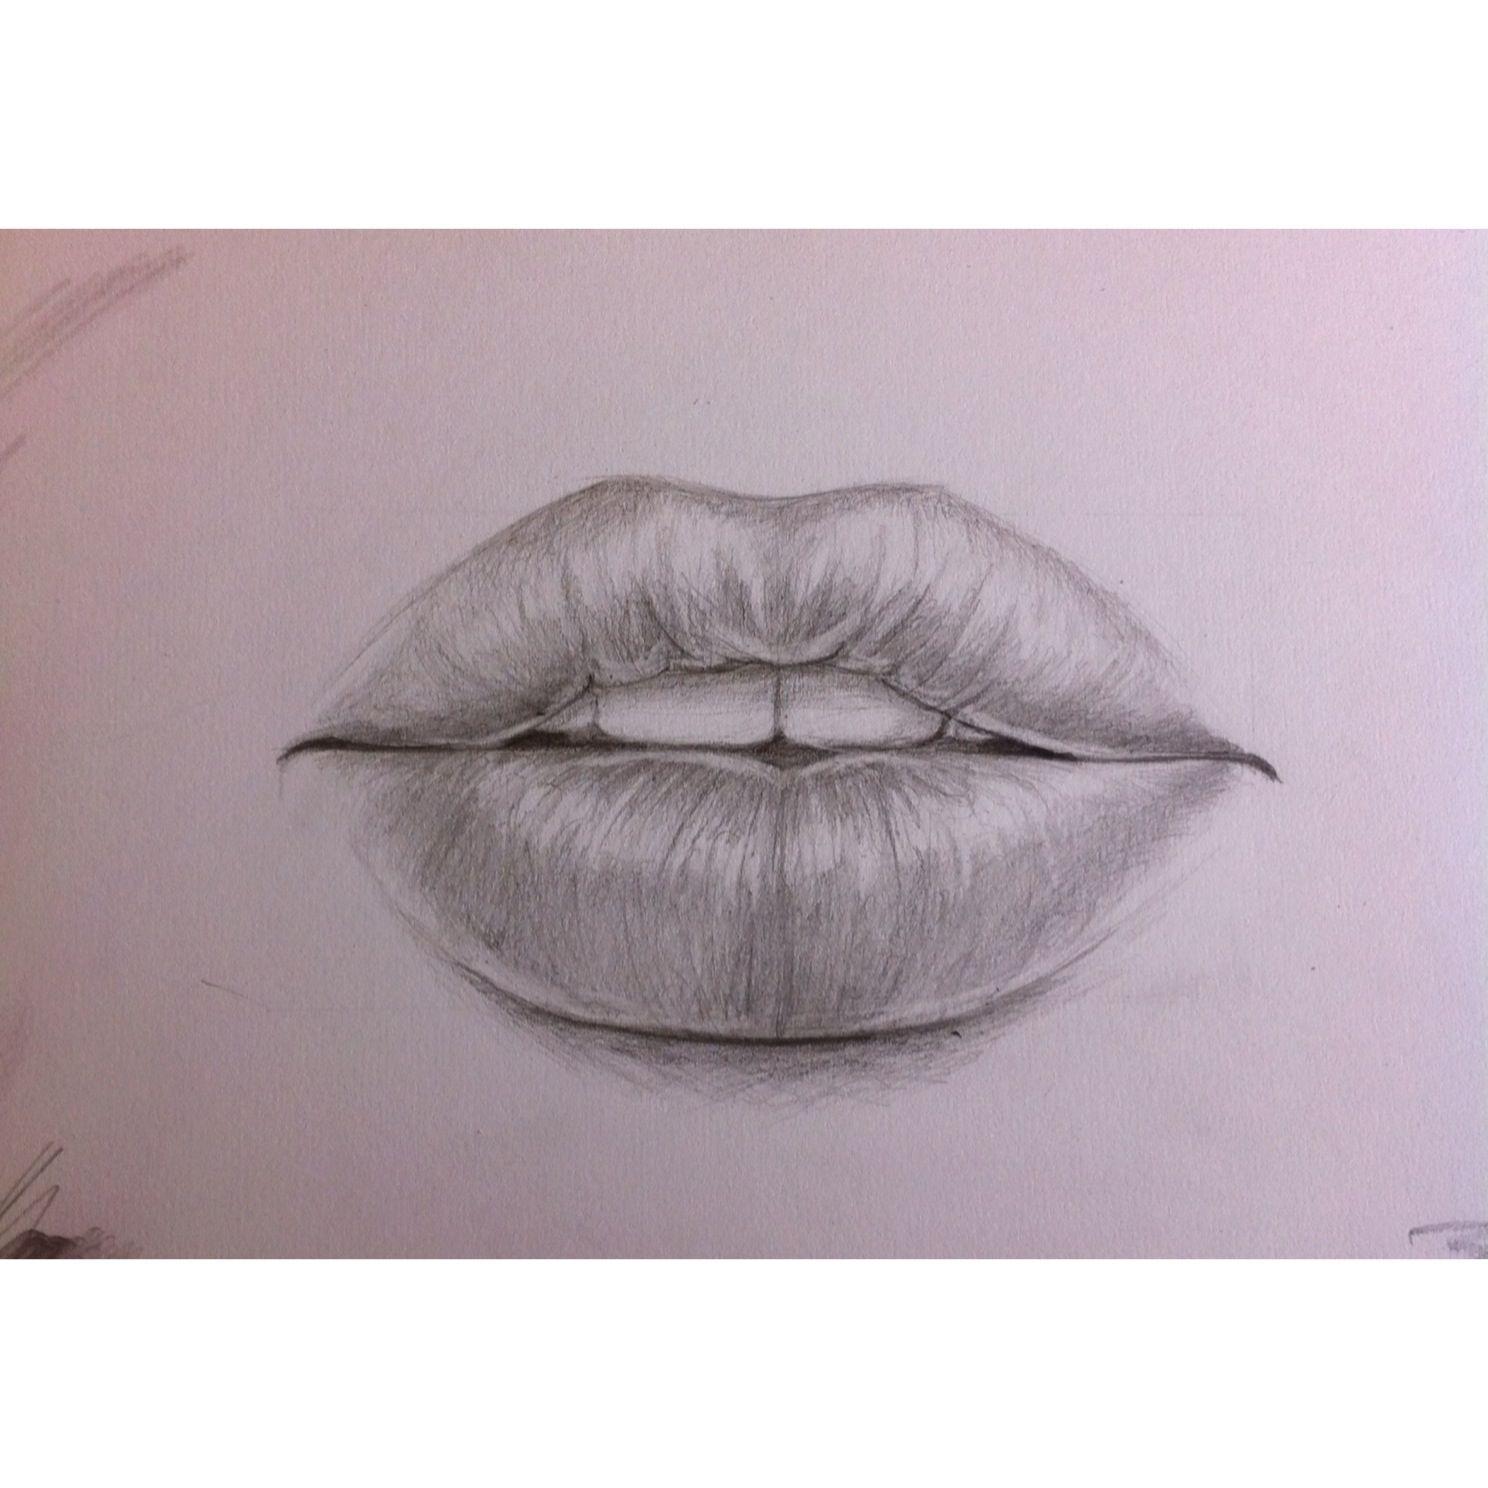 Pencil drawing of lips art scratchboard art pencil drawings